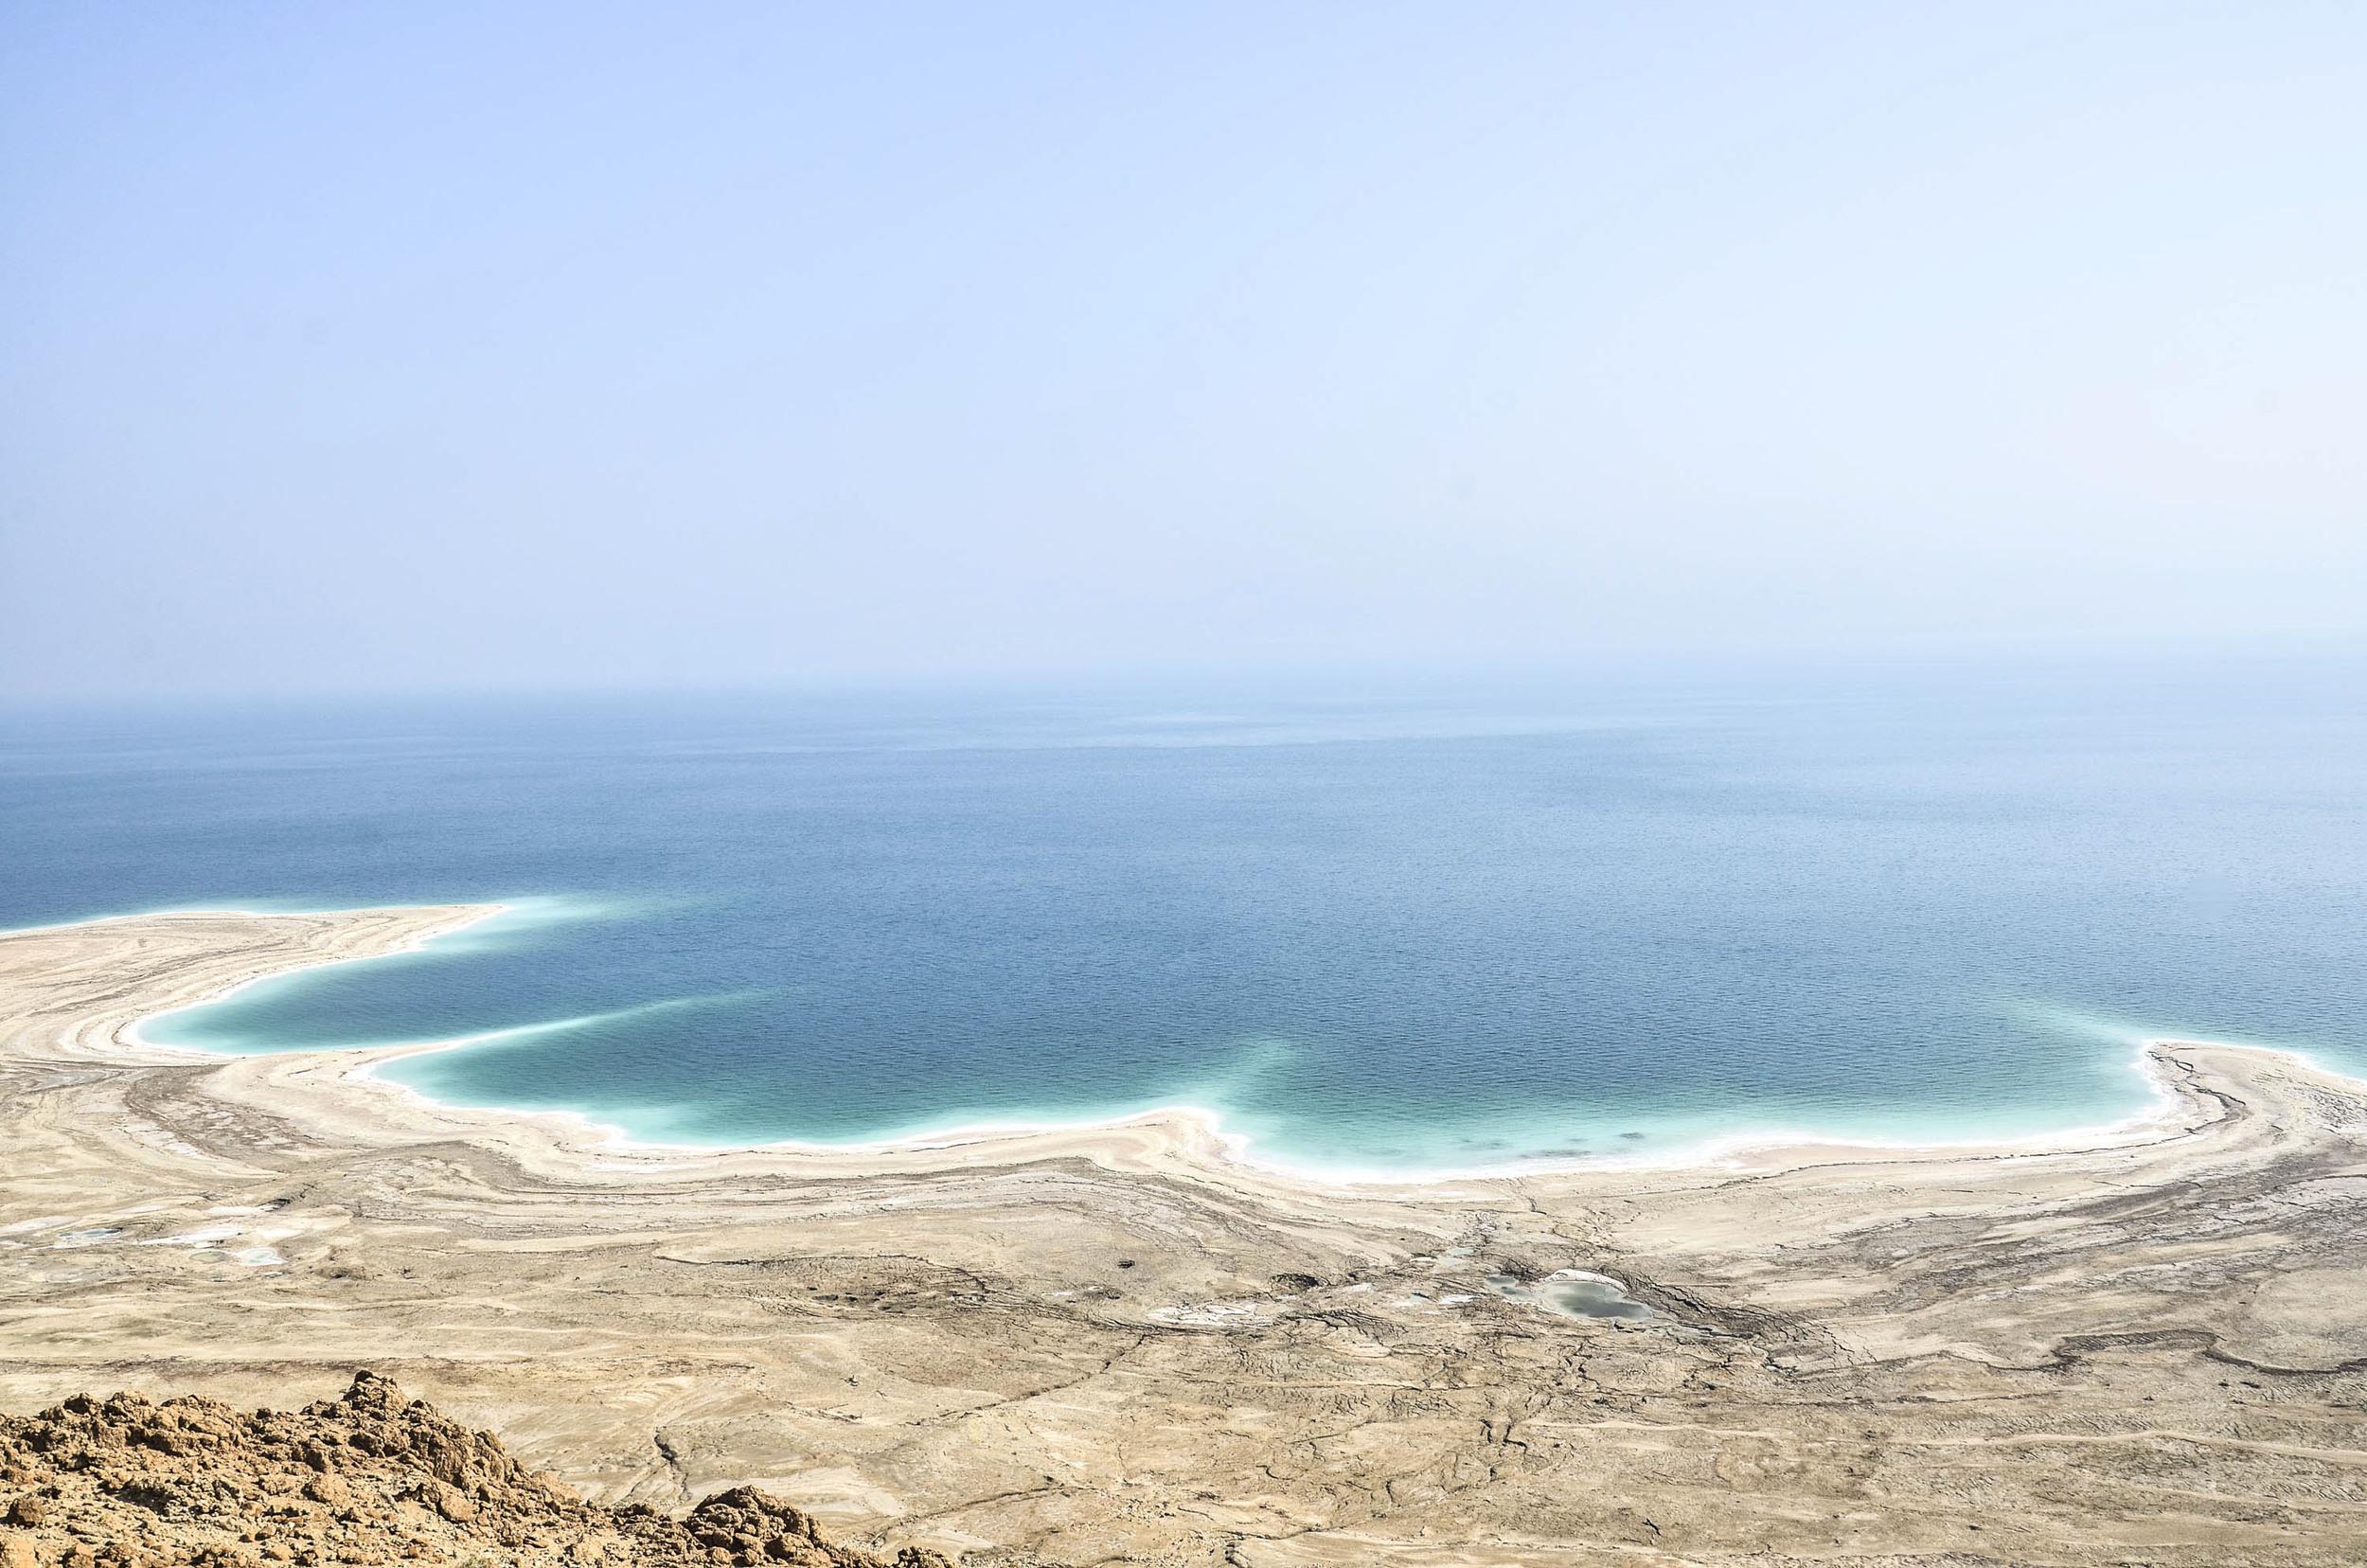 Ella Leshman Photography .אלה לשמן צילום.The Dead Sea-19.jpg